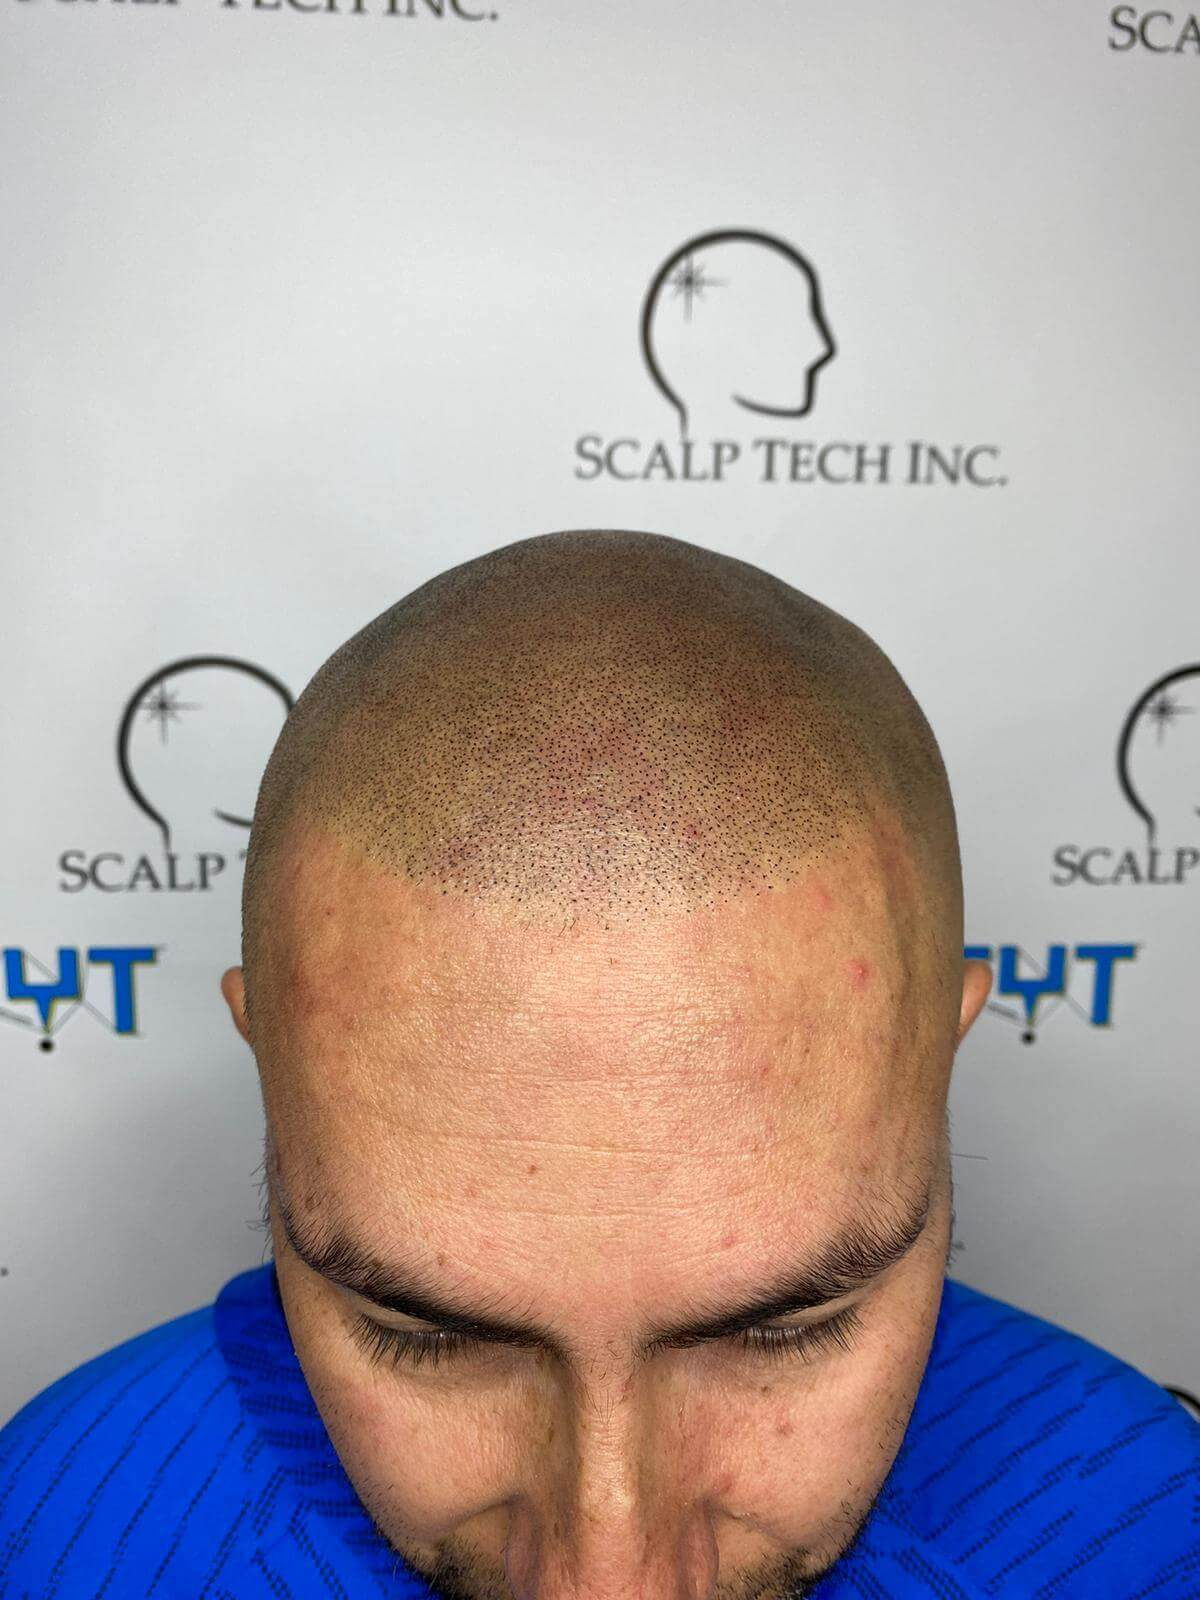 scalp micropigmentation | Scalp Tech Inc.